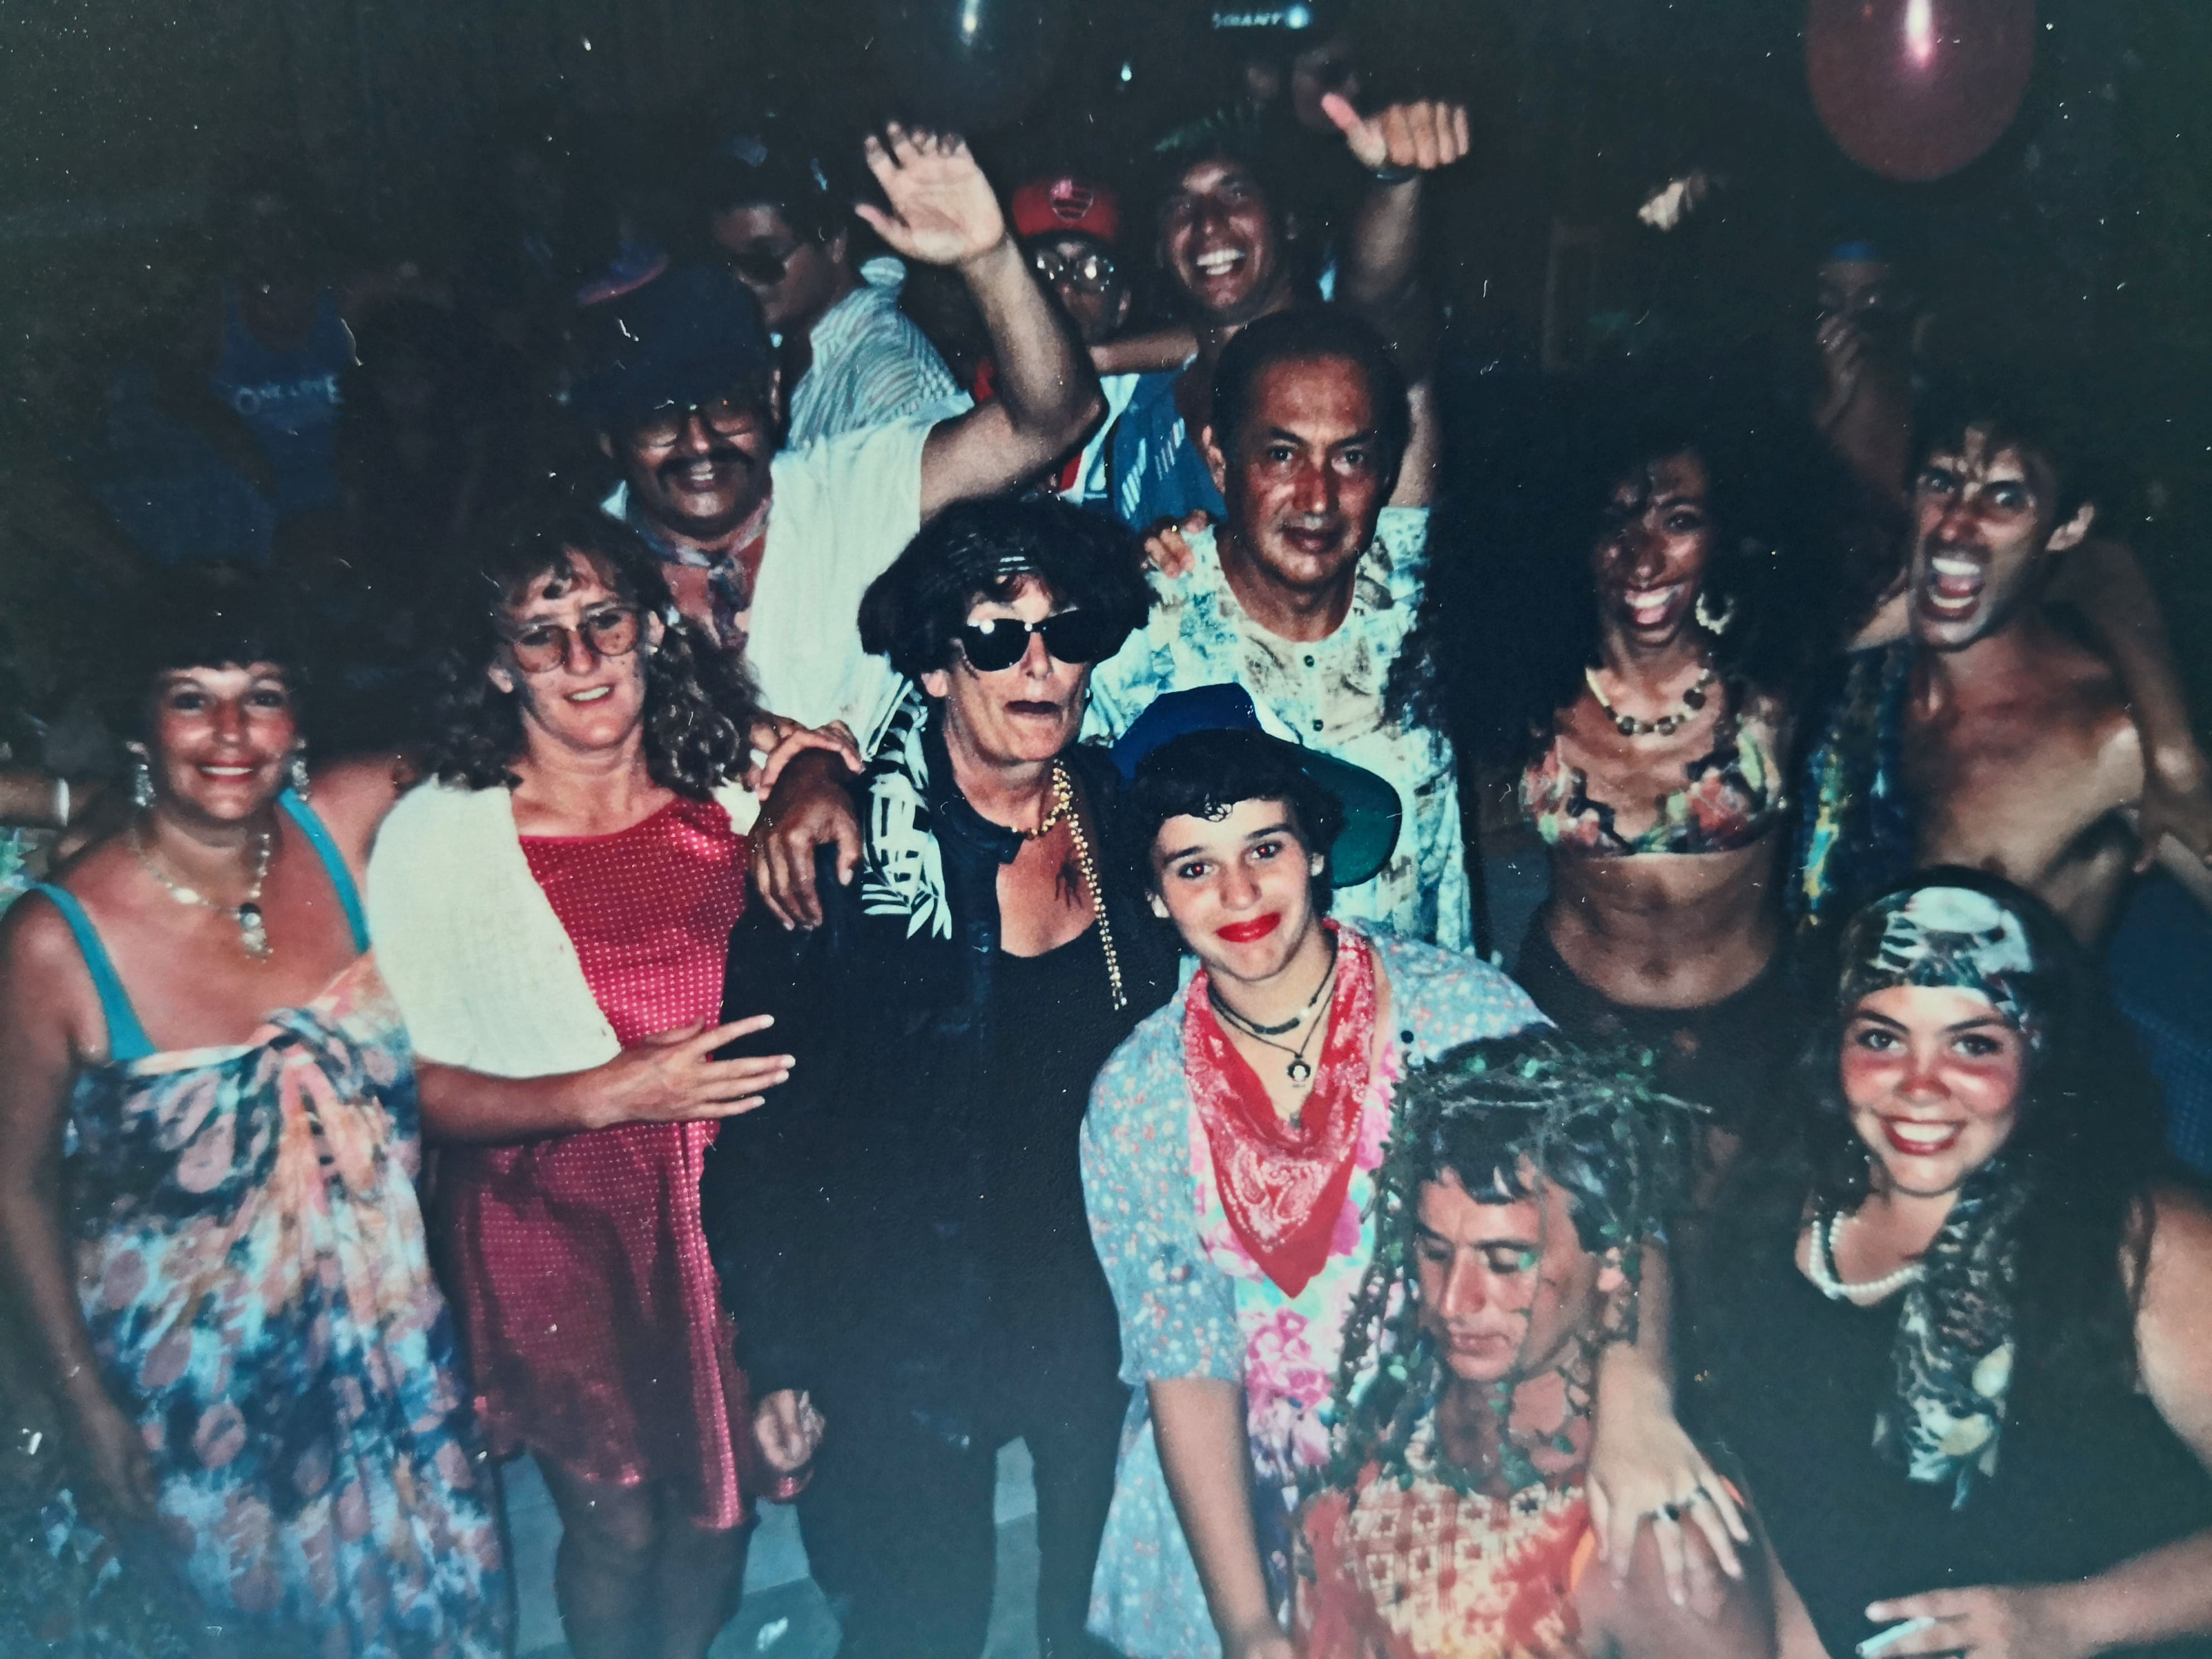 FESTA A FANTASIA 1995